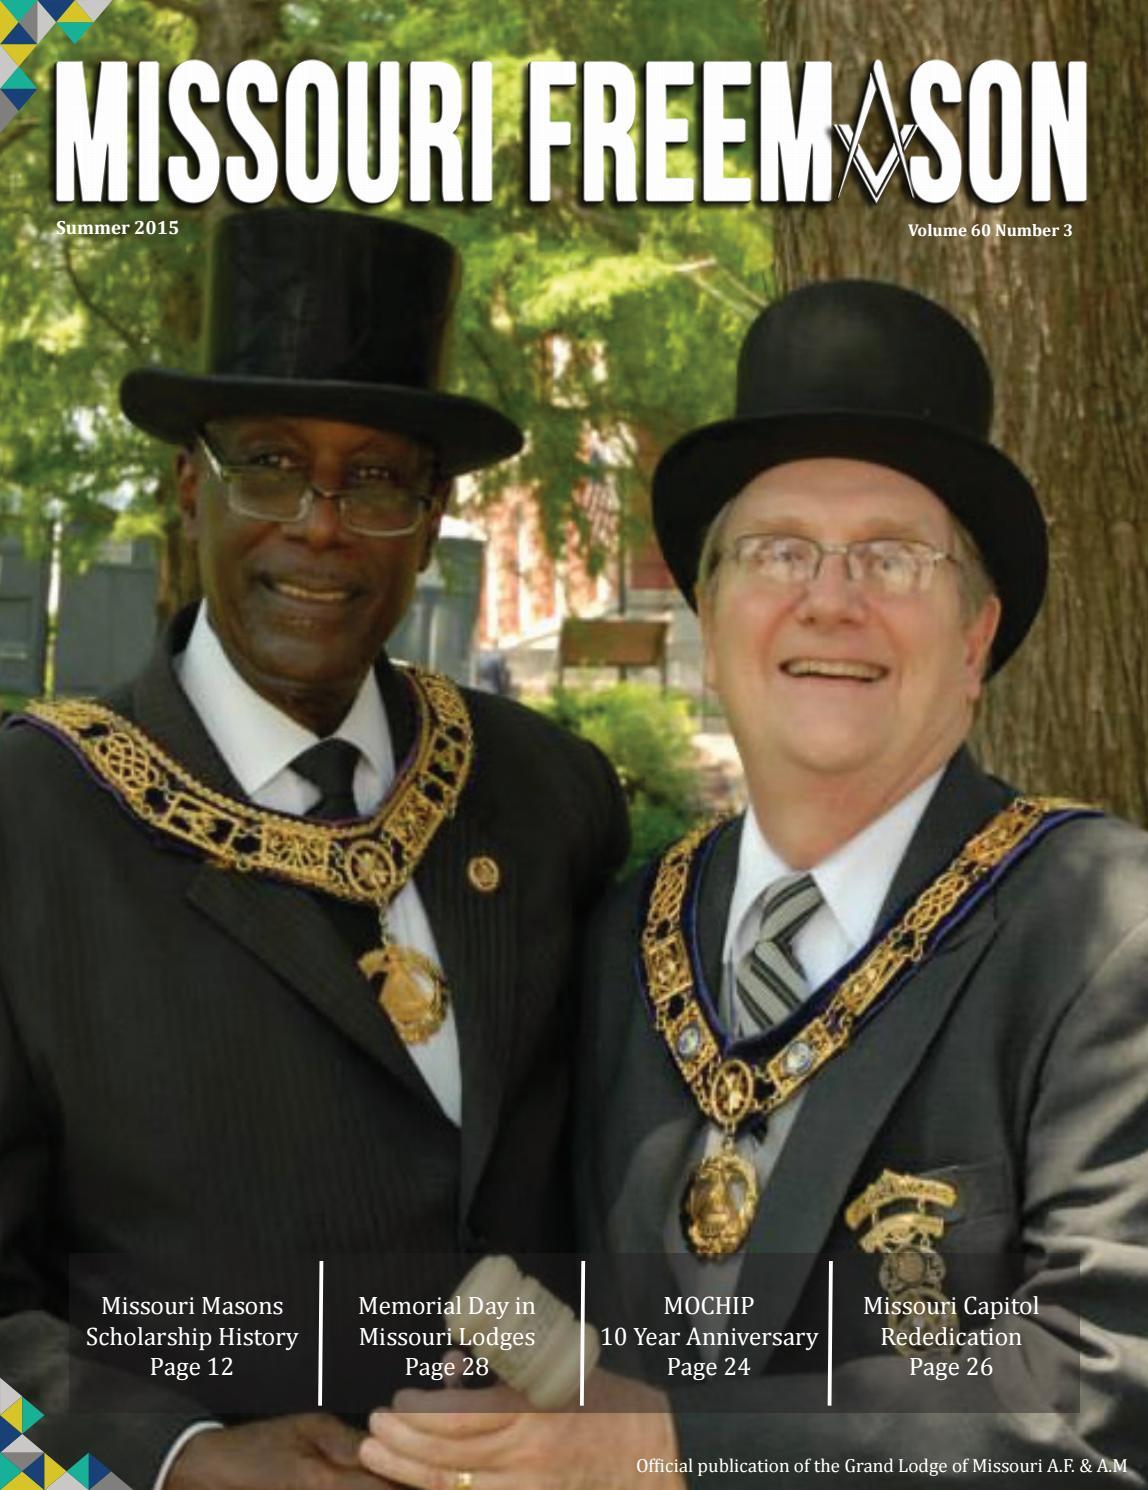 Missouri freemason magazine v60n03 2015 summer by missouri missouri freemason magazine v60n03 2015 summer by missouri freemasons issuu m4hsunfo